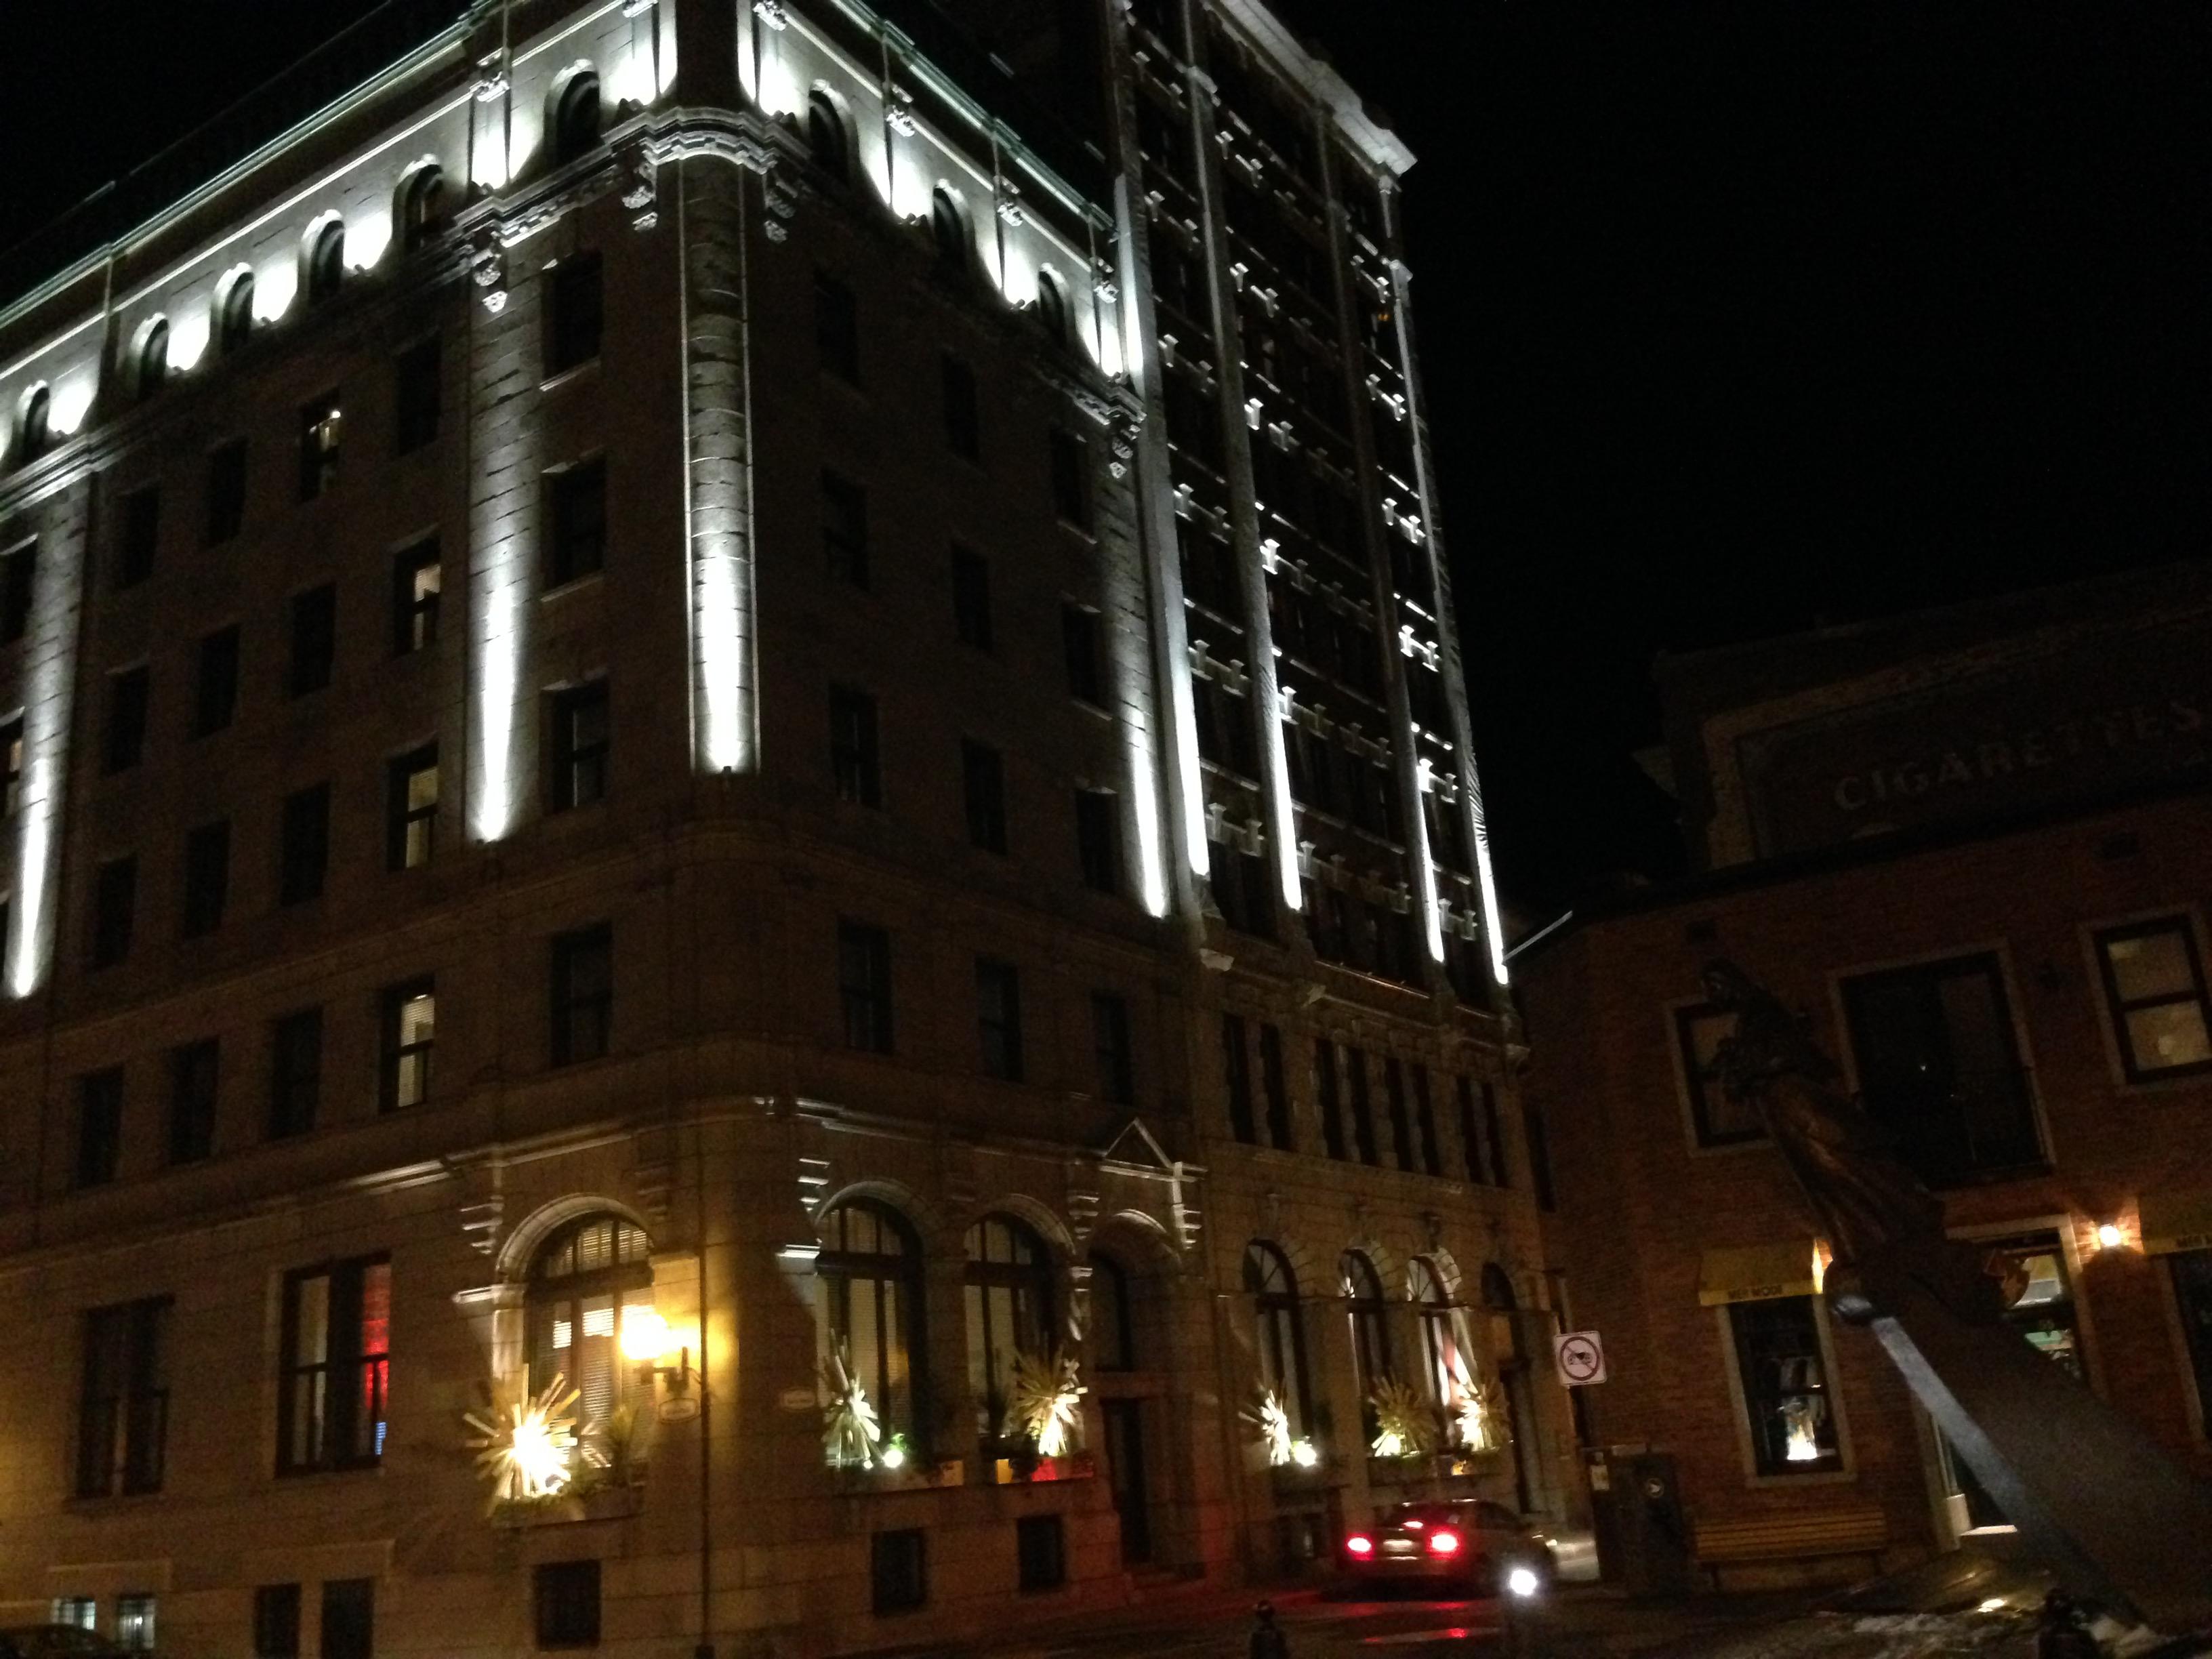 St Germain Hotel Quebec City